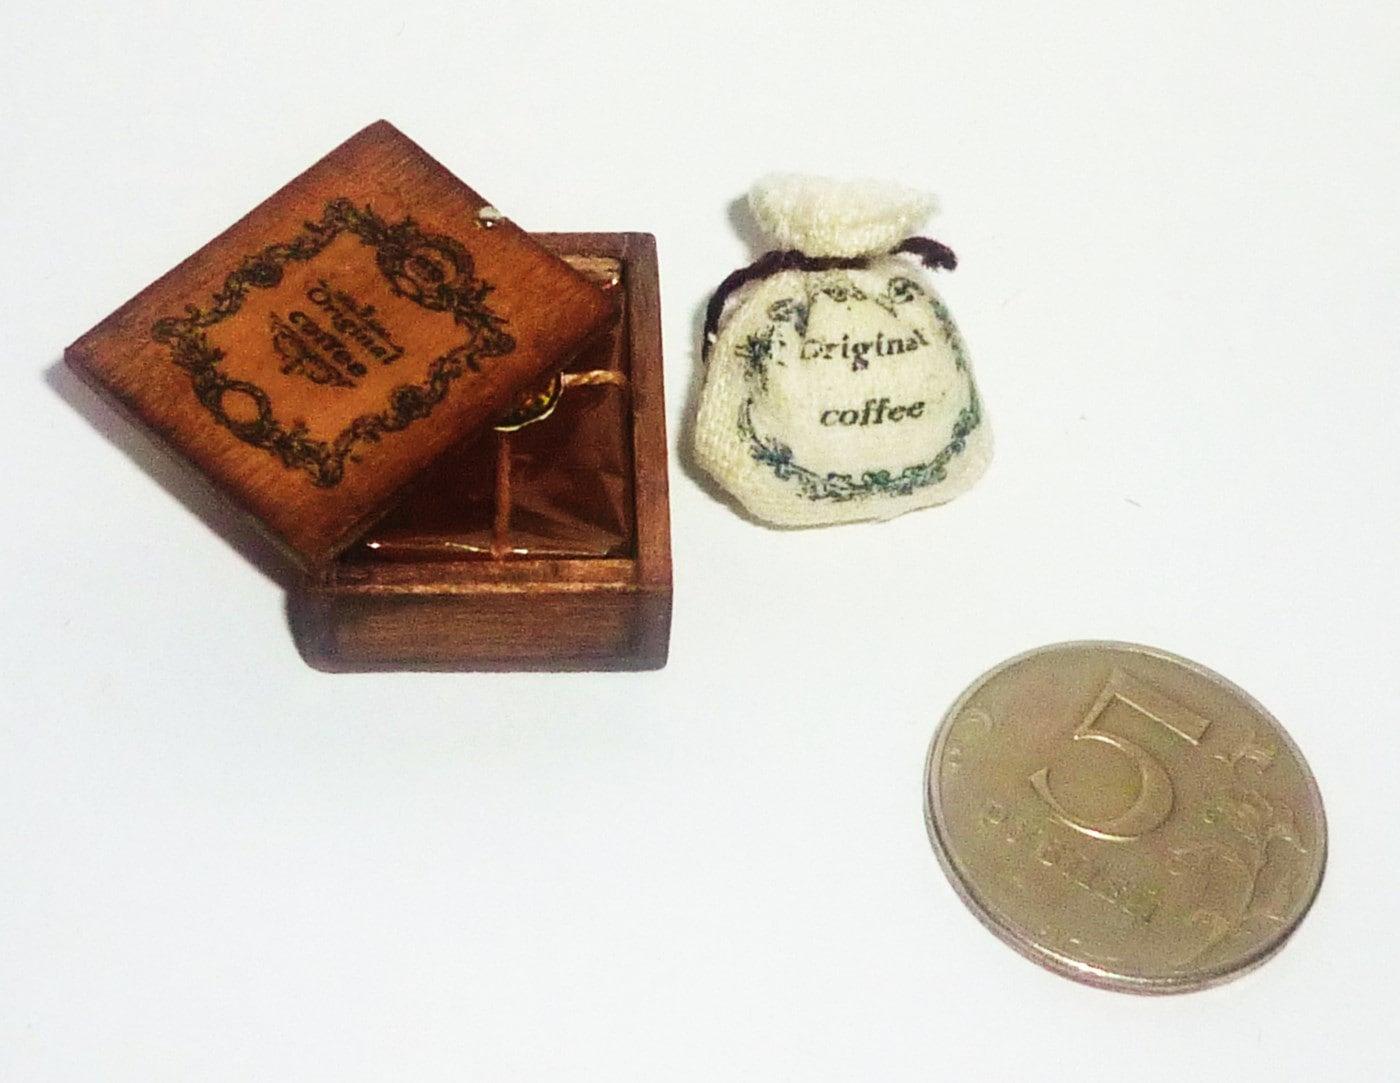 Dollhouse Miniature 1 12 Box Of Coffee Coffee Coffee Bag